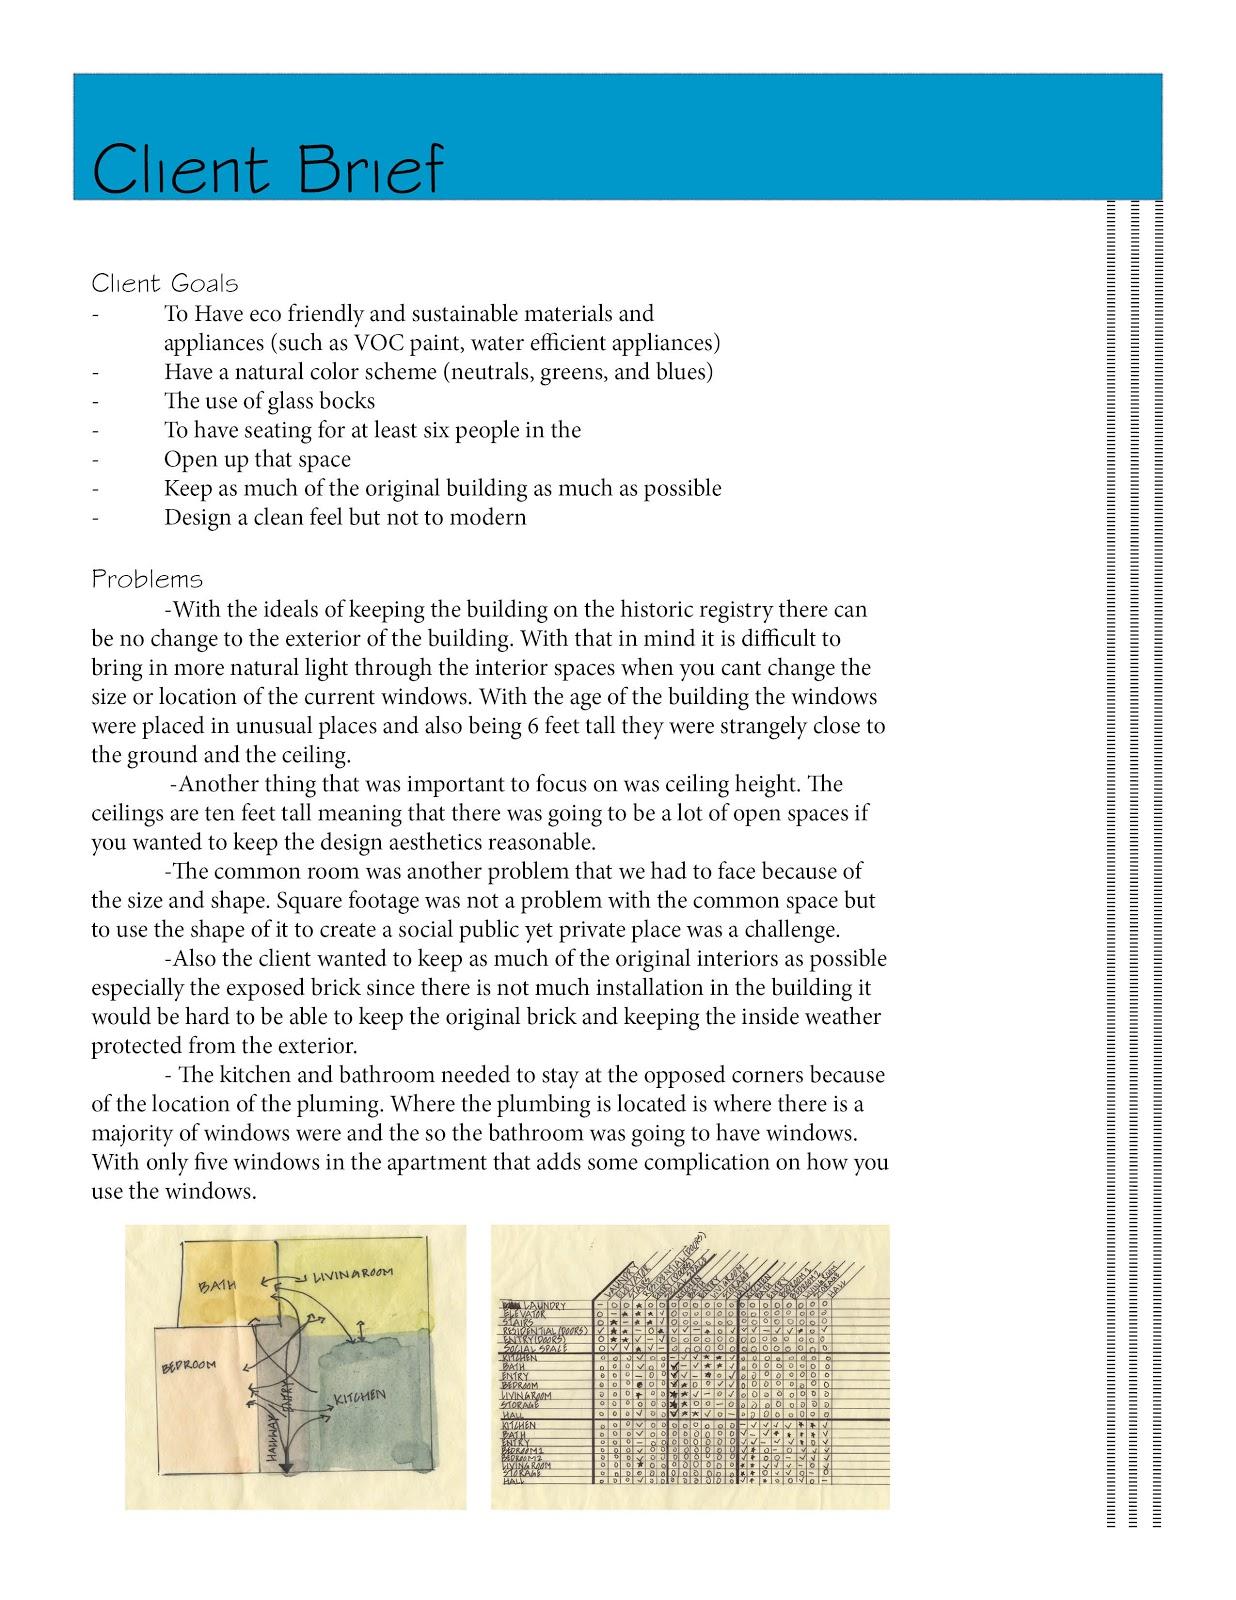 Interior Design Client Questionnaire Examples